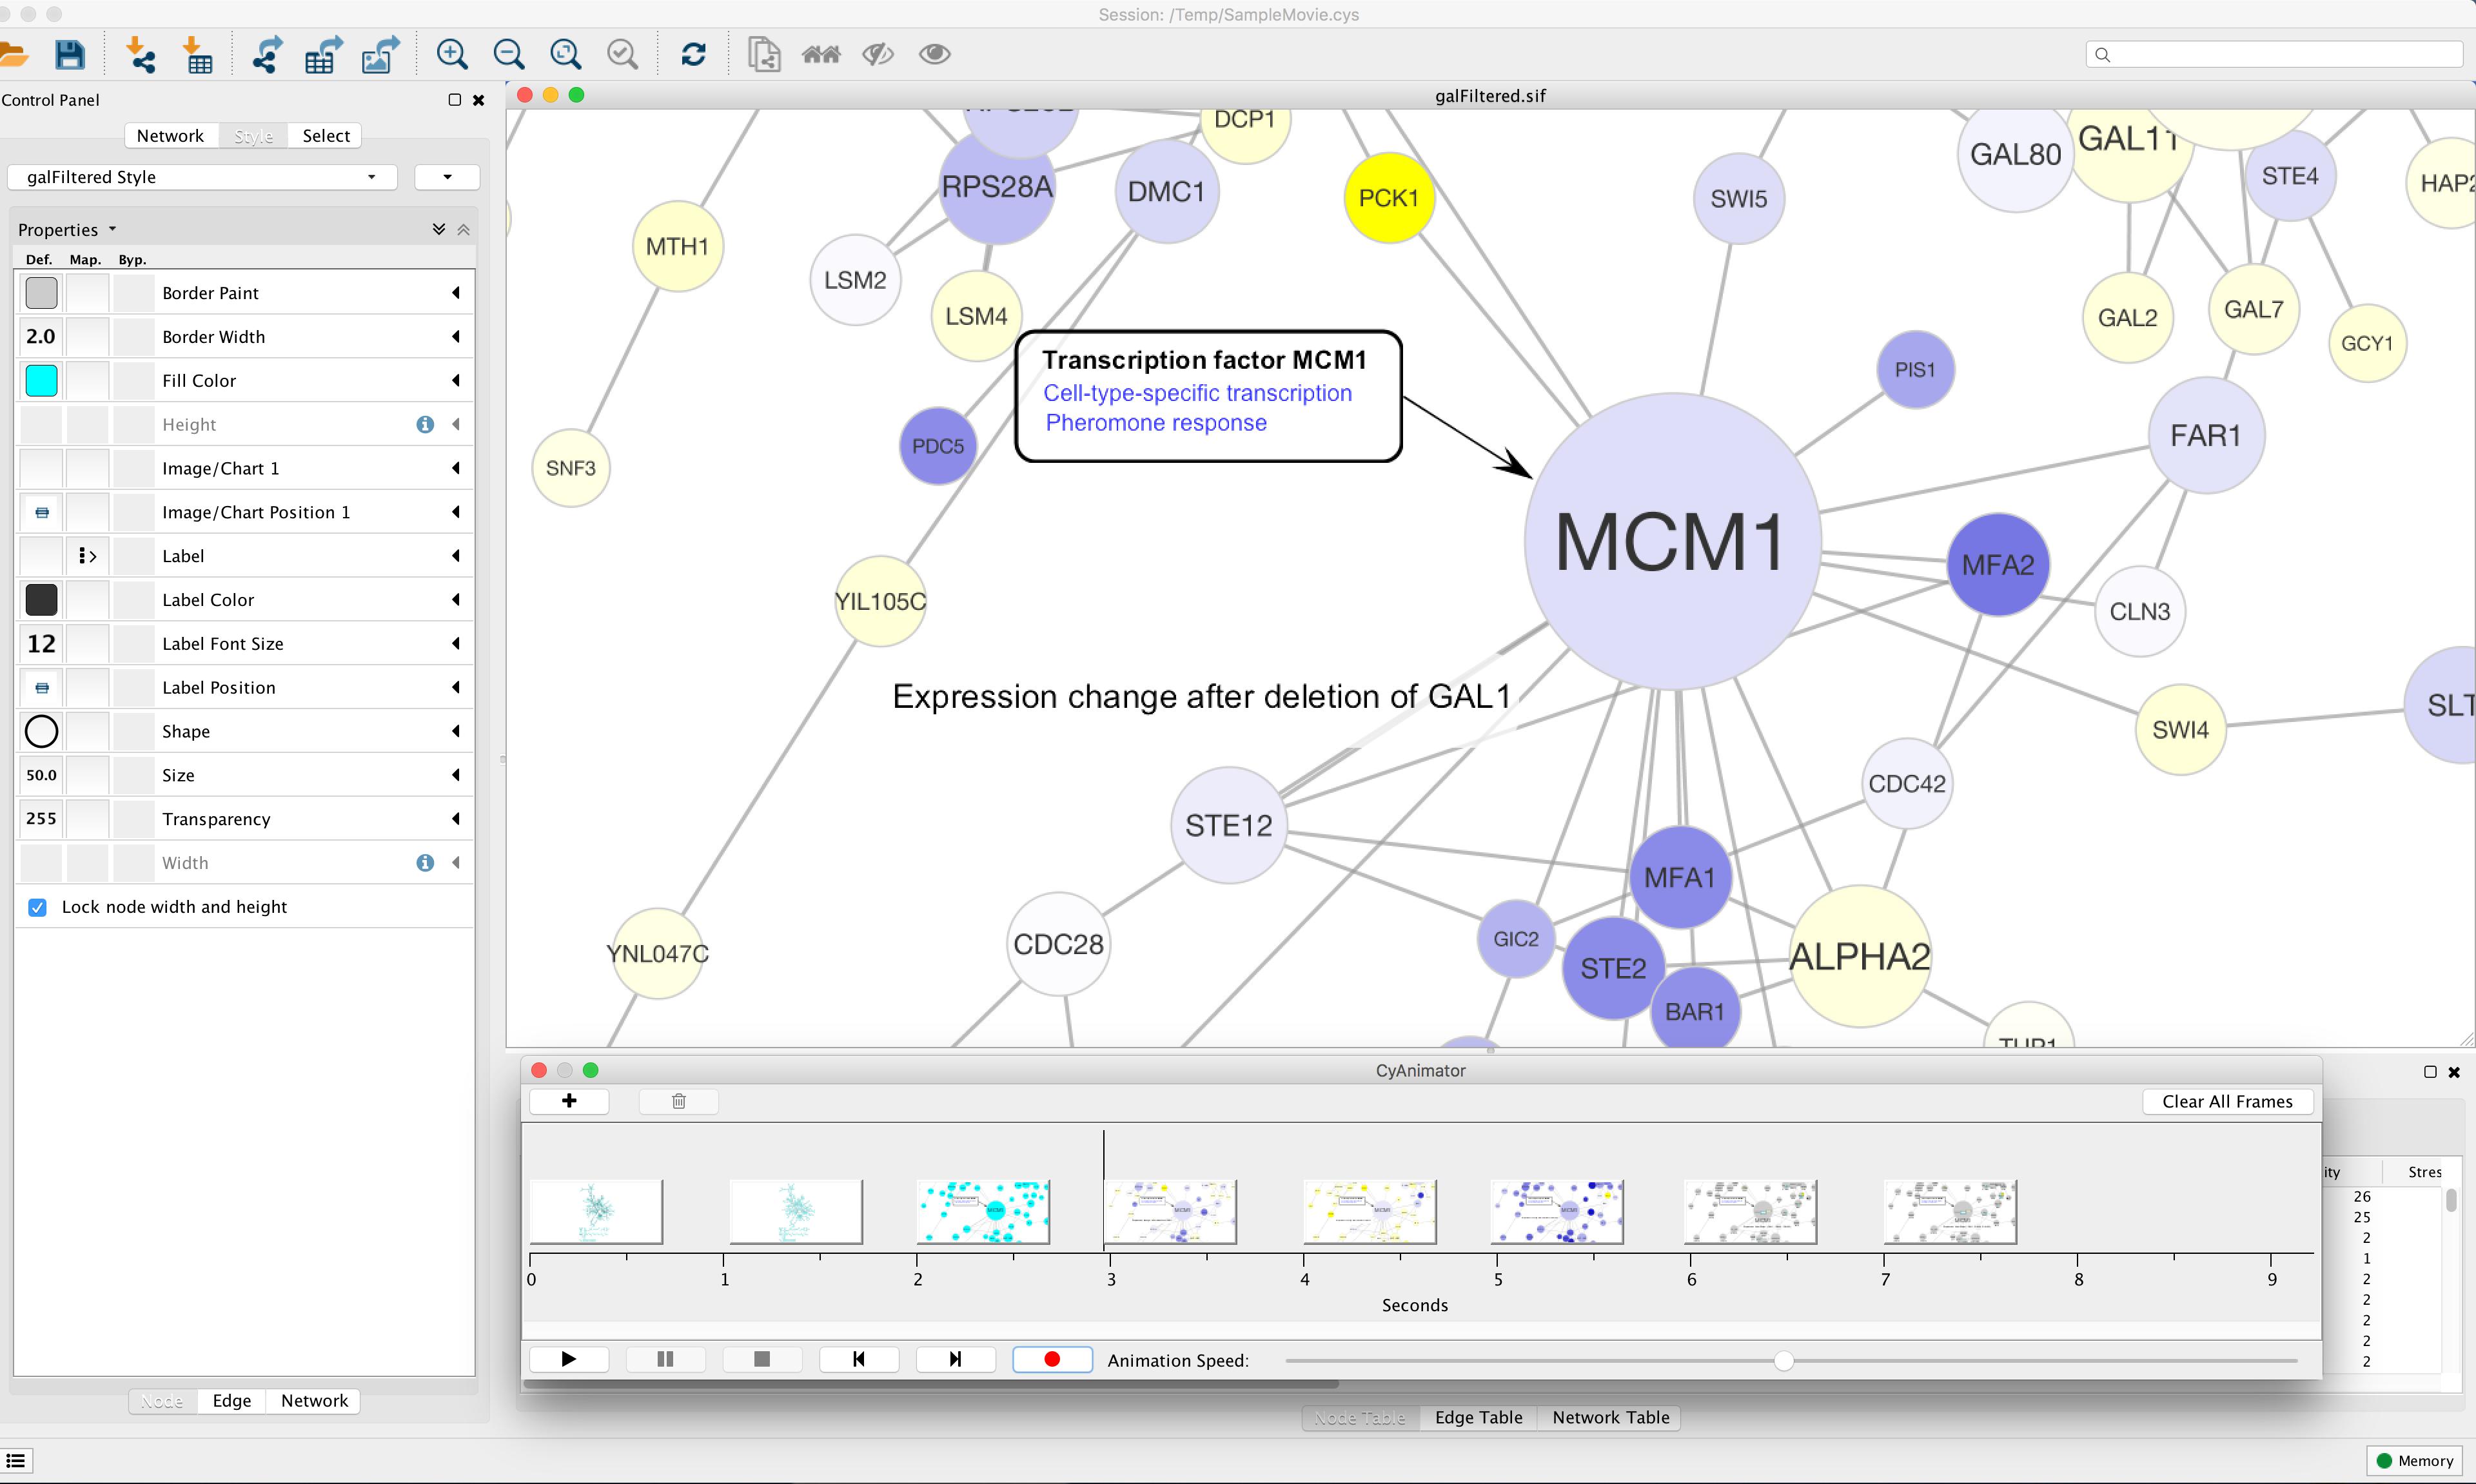 CyAnimator: Simple Animation of Cytoscape Networks